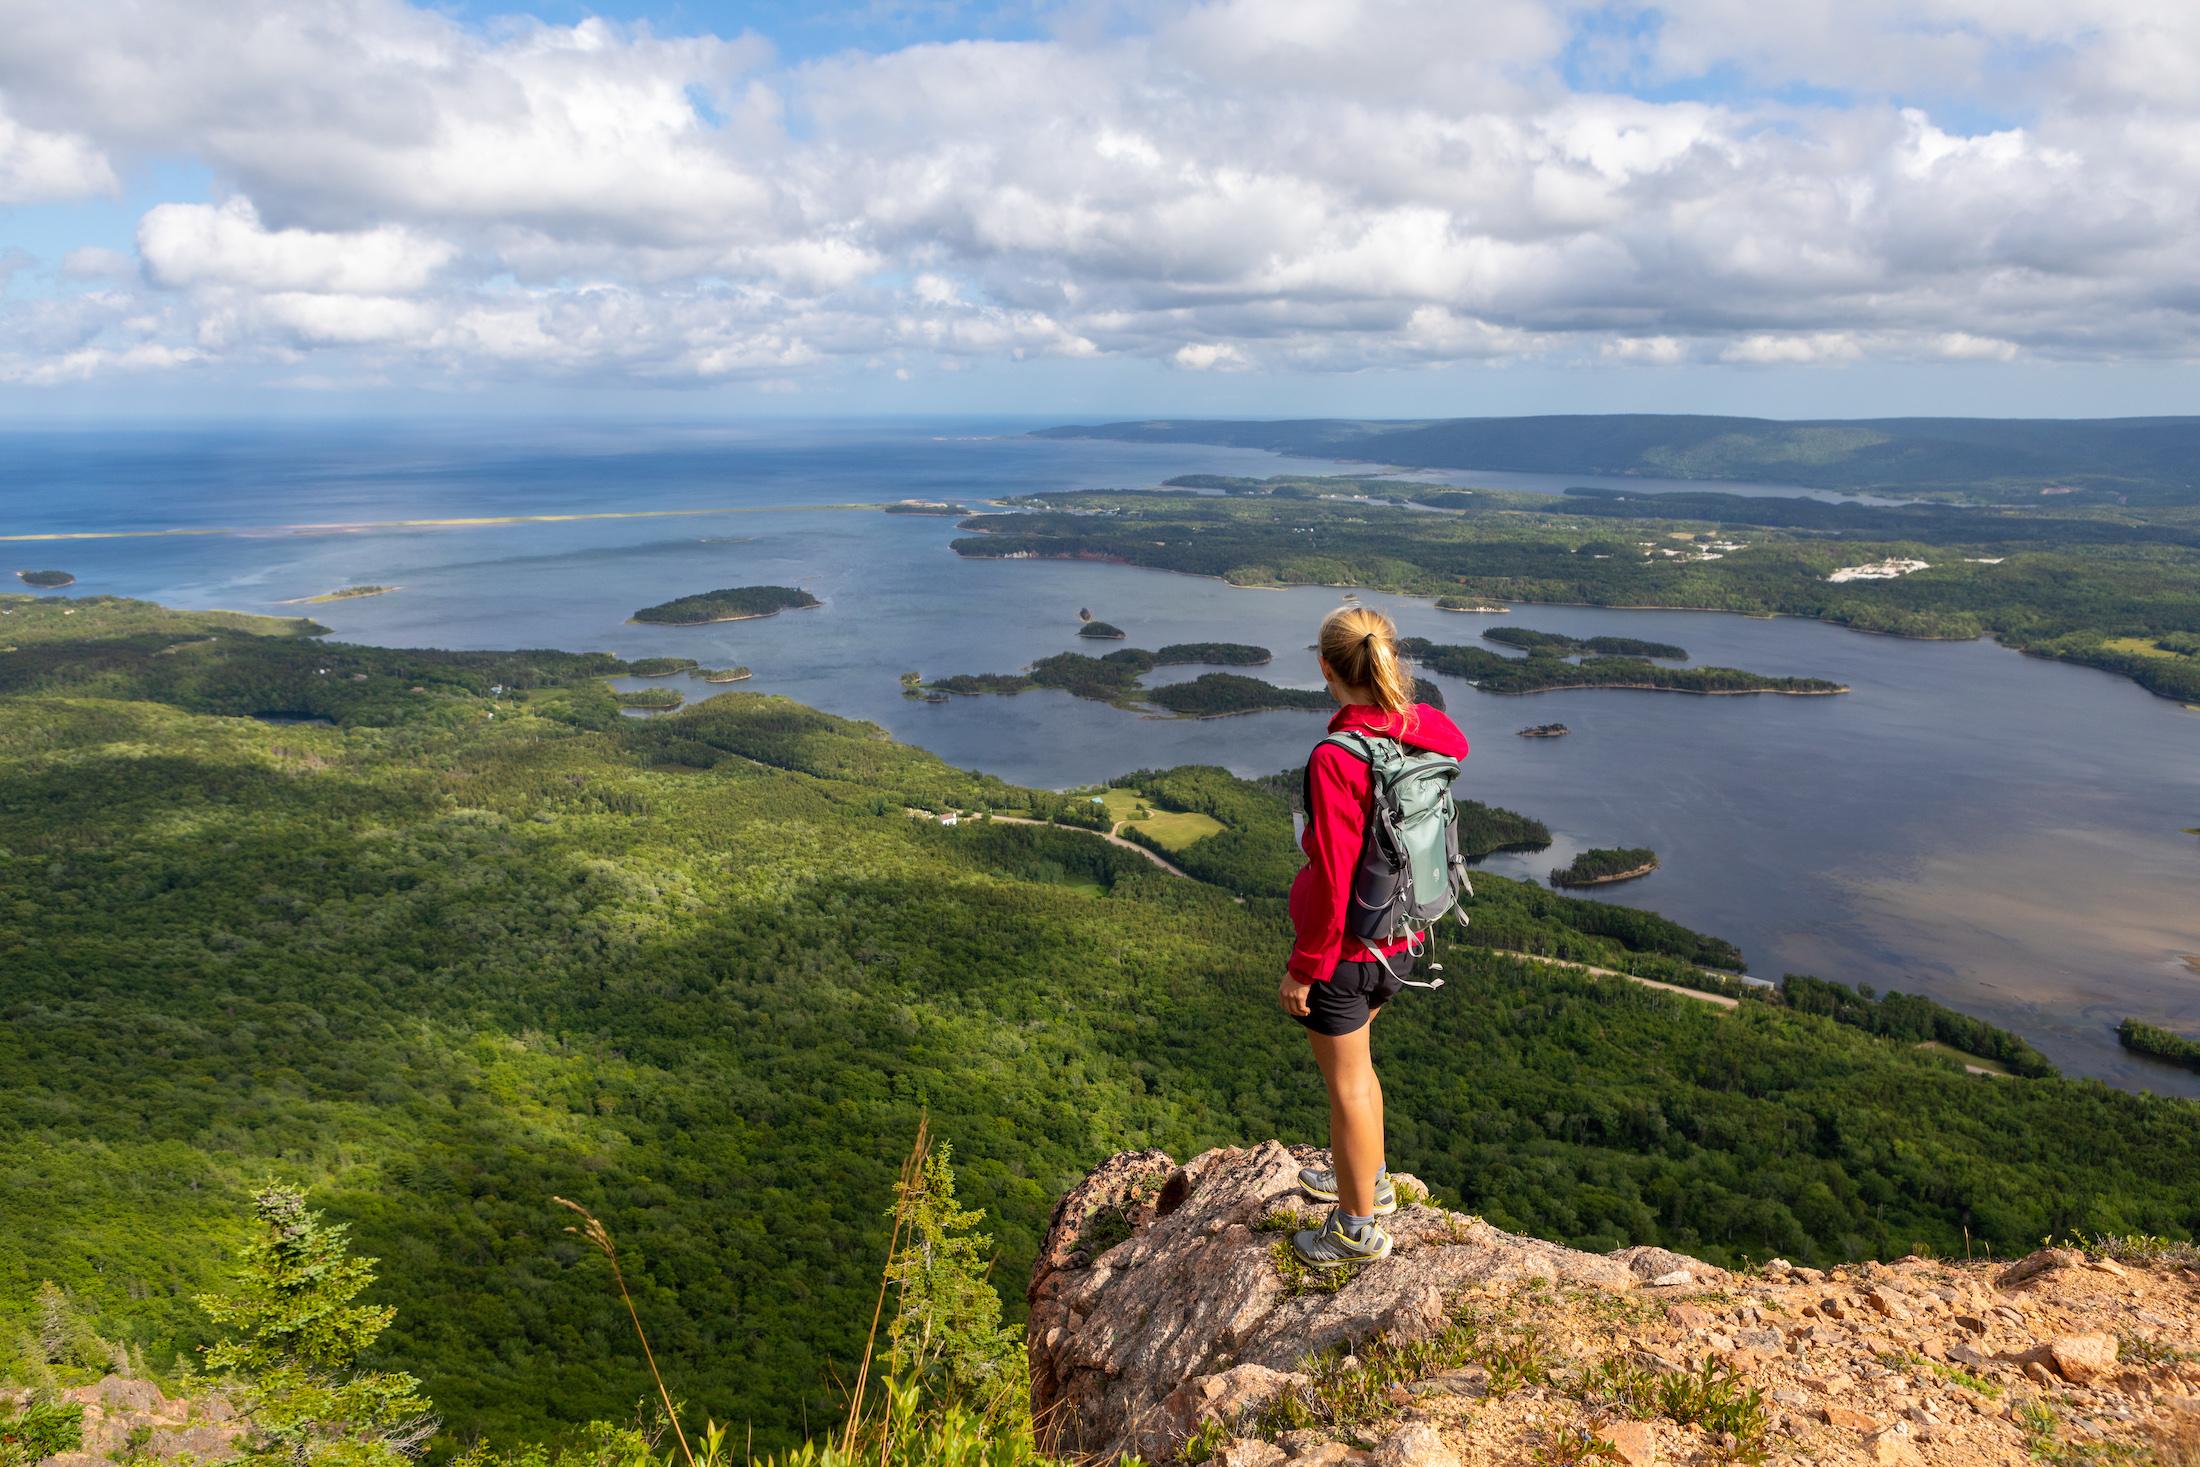 Cape Breton Outdoor Adventures Destination Cape Breton